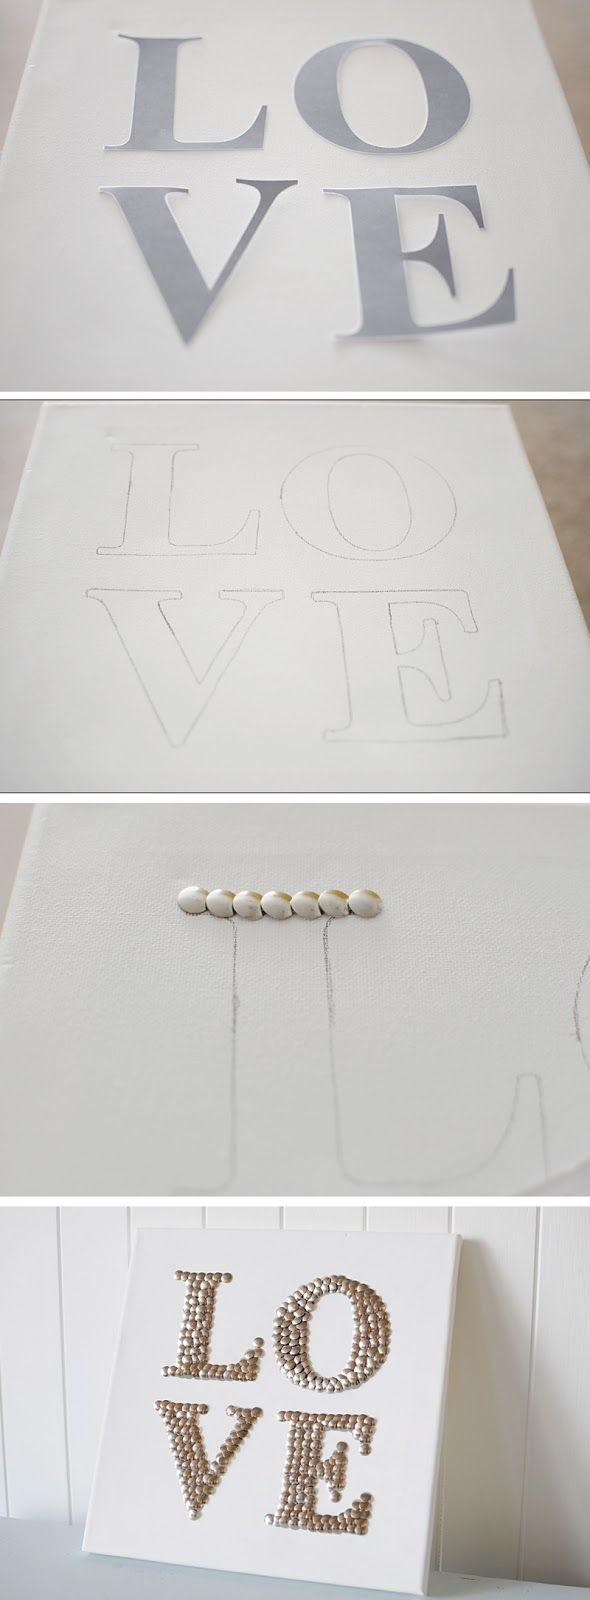 How to make Push Pin Art